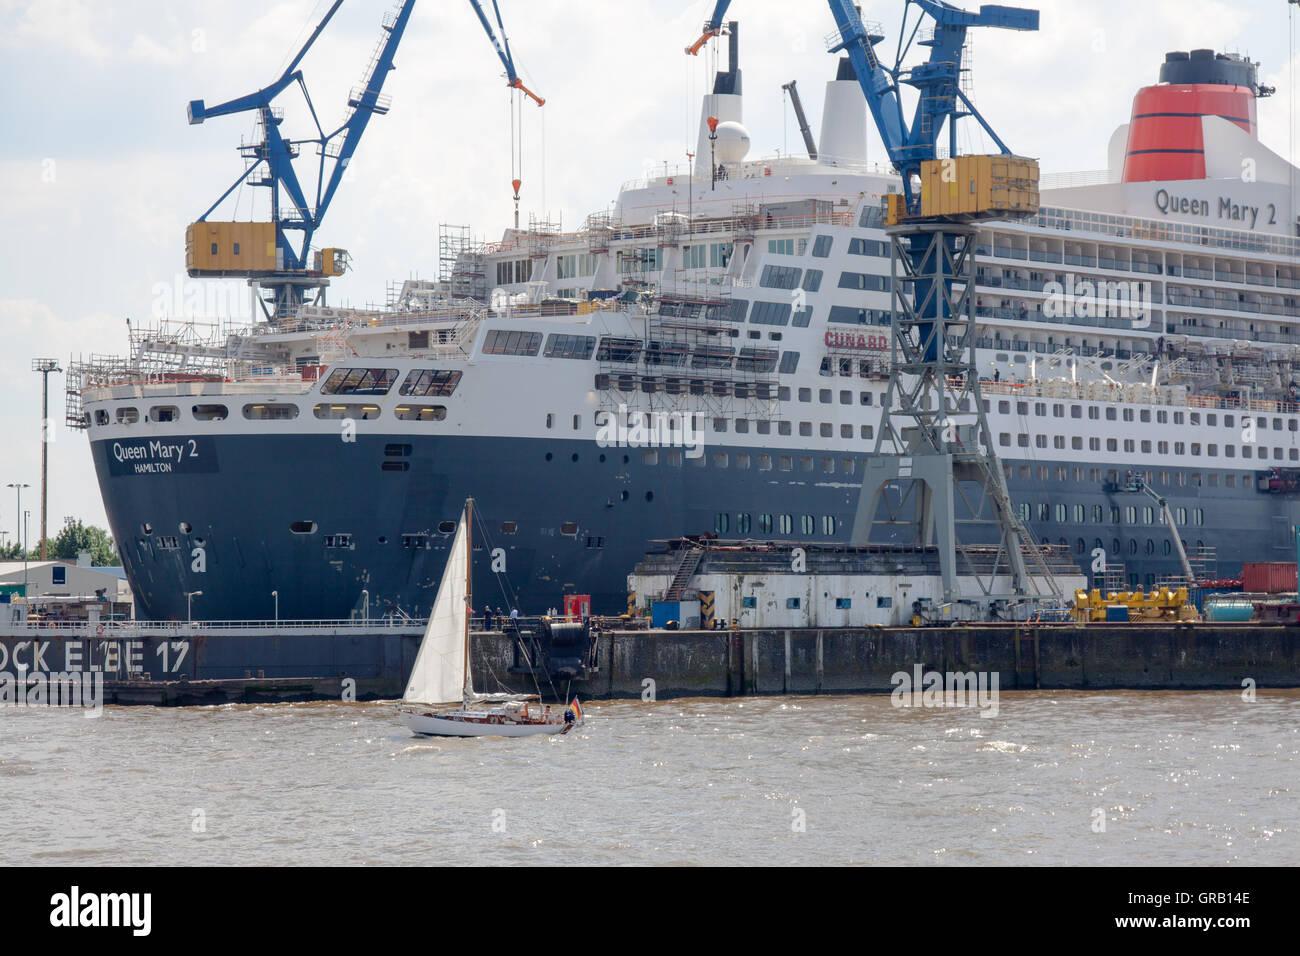 Queen Mary 2 In Dry Dock In Hamburg - Stock Image